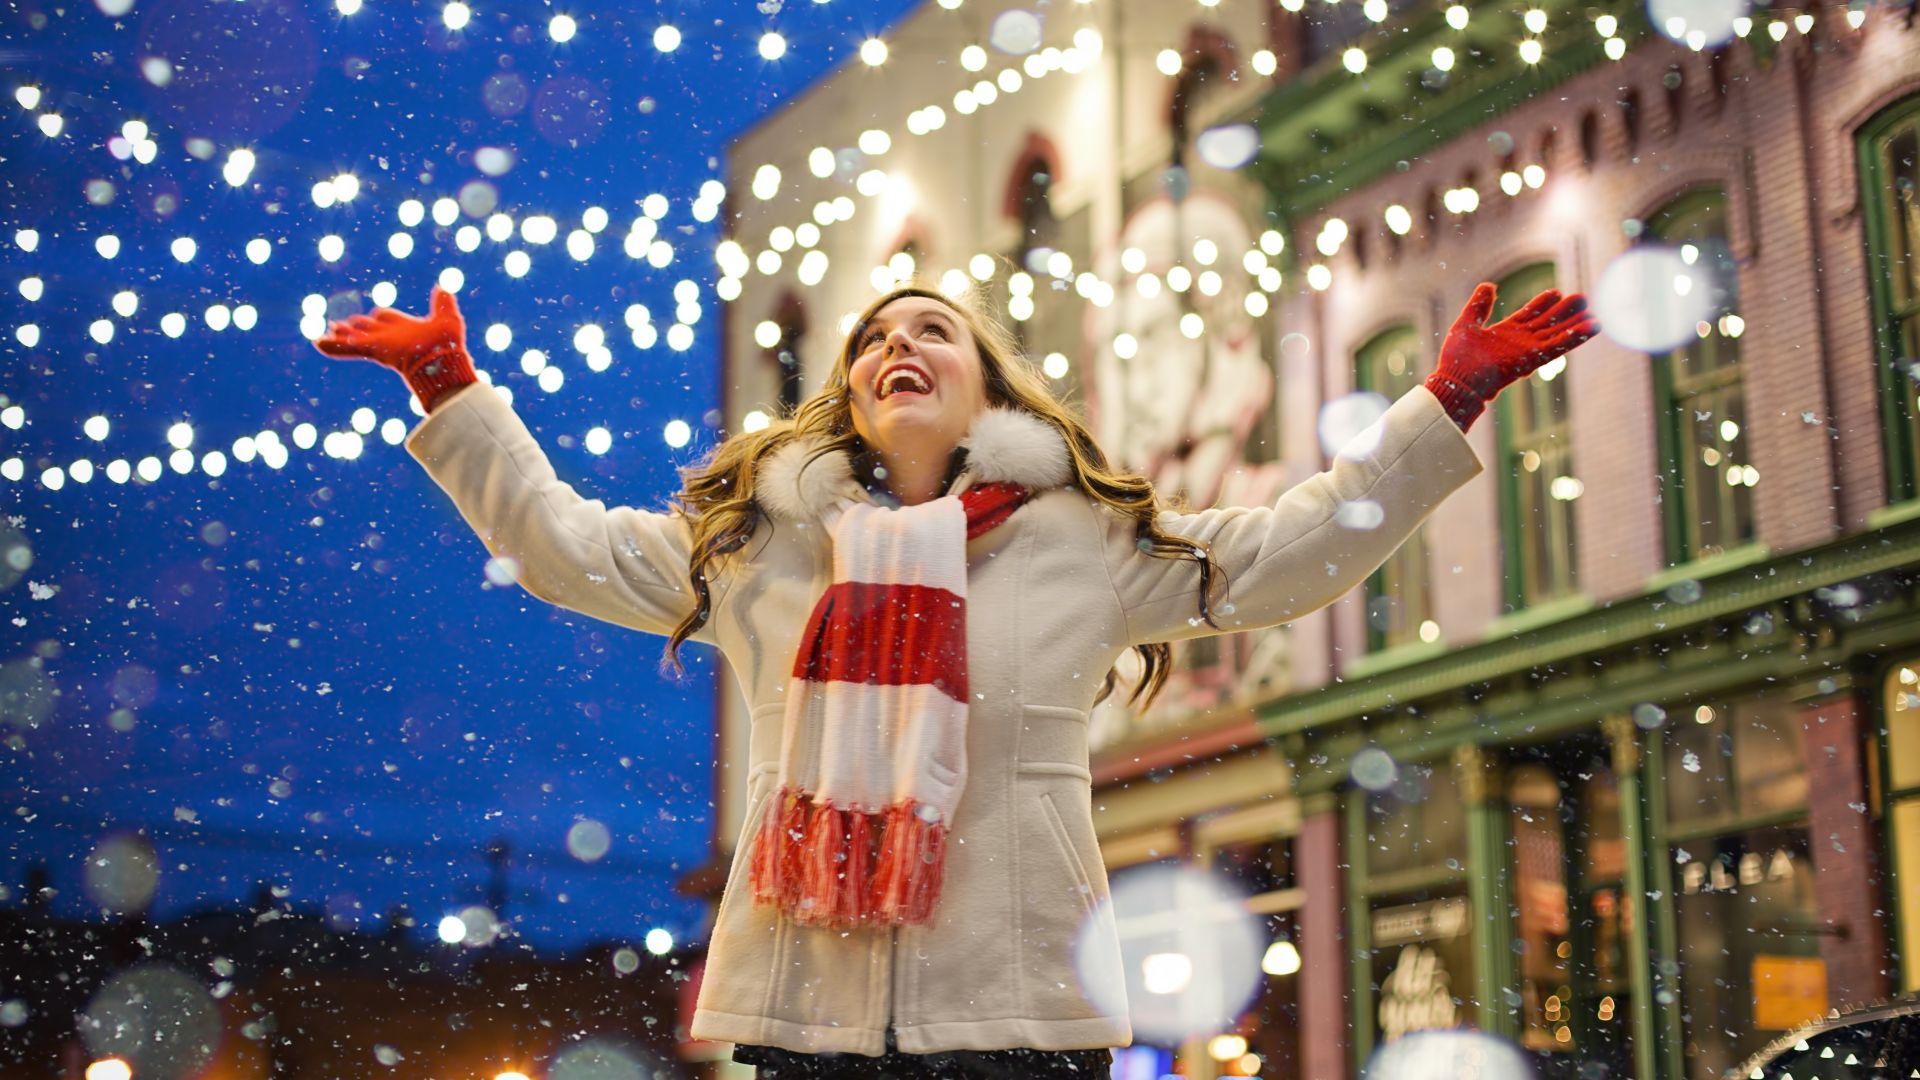 Wallpaper Christmas, happiness, celebrations, snowfall, 5k